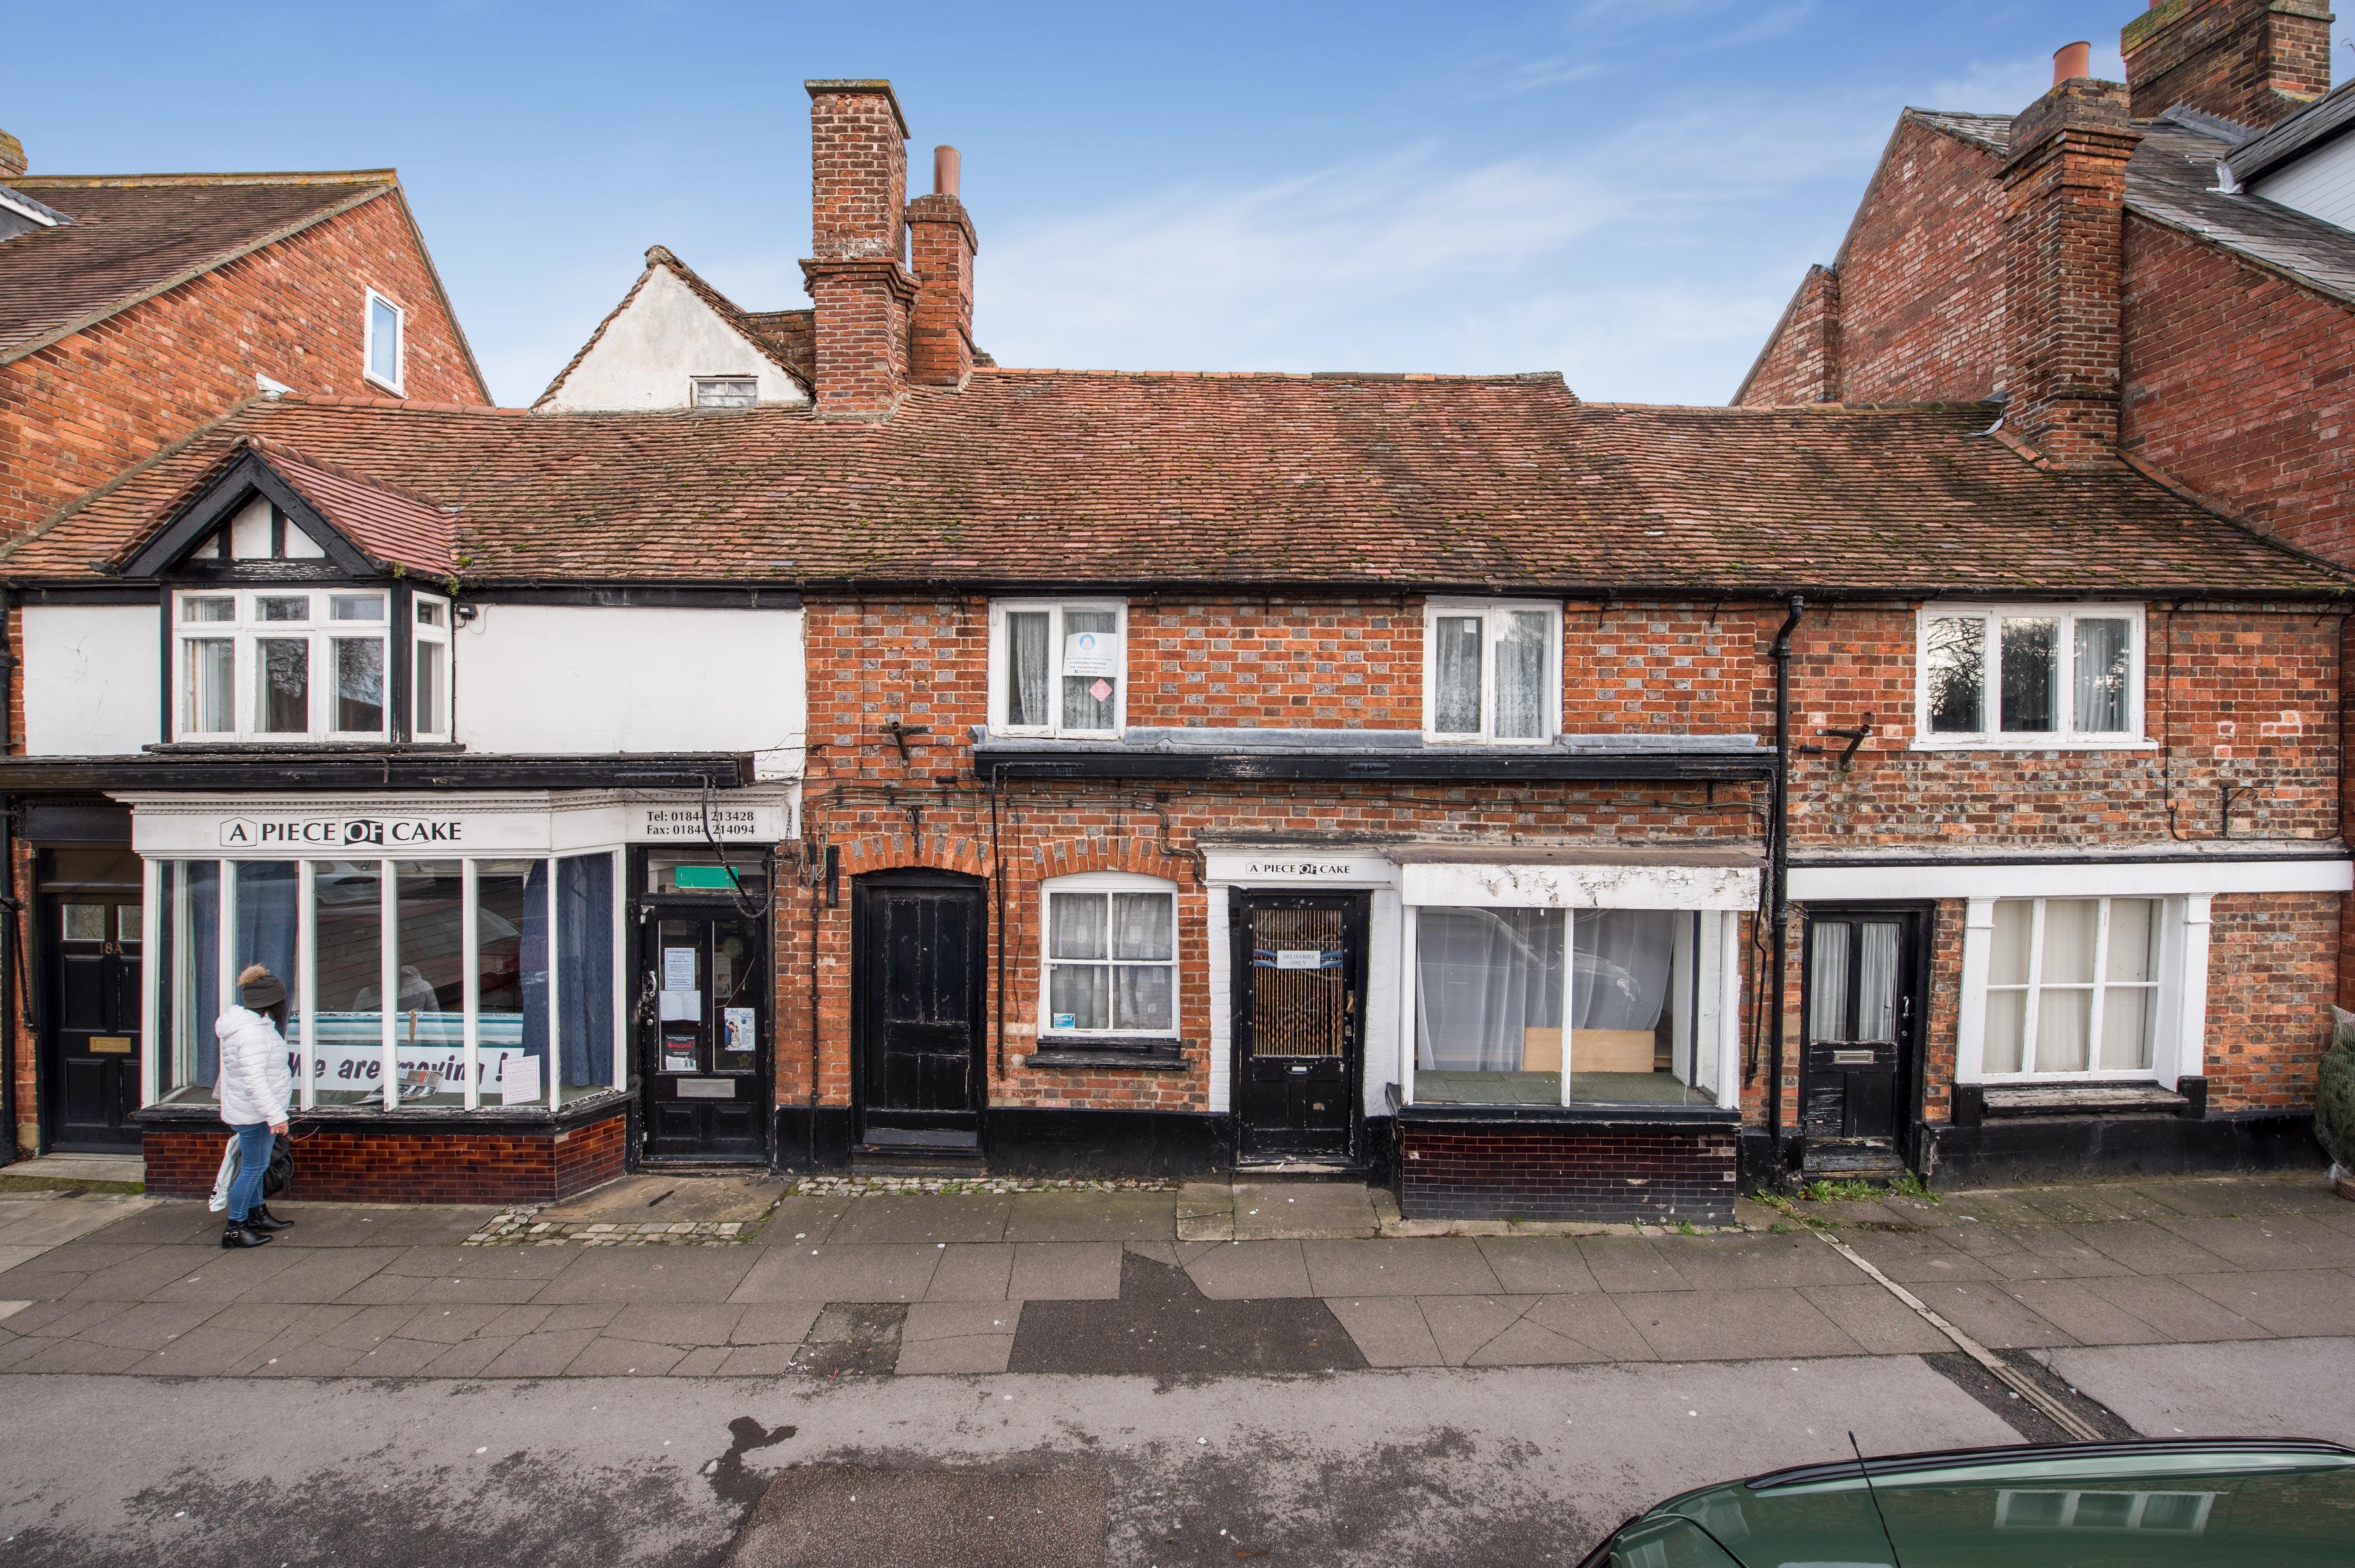 18-20 Upper High Street, Thame, Retail / Residential / Investment For Sale - Fields30.jpg